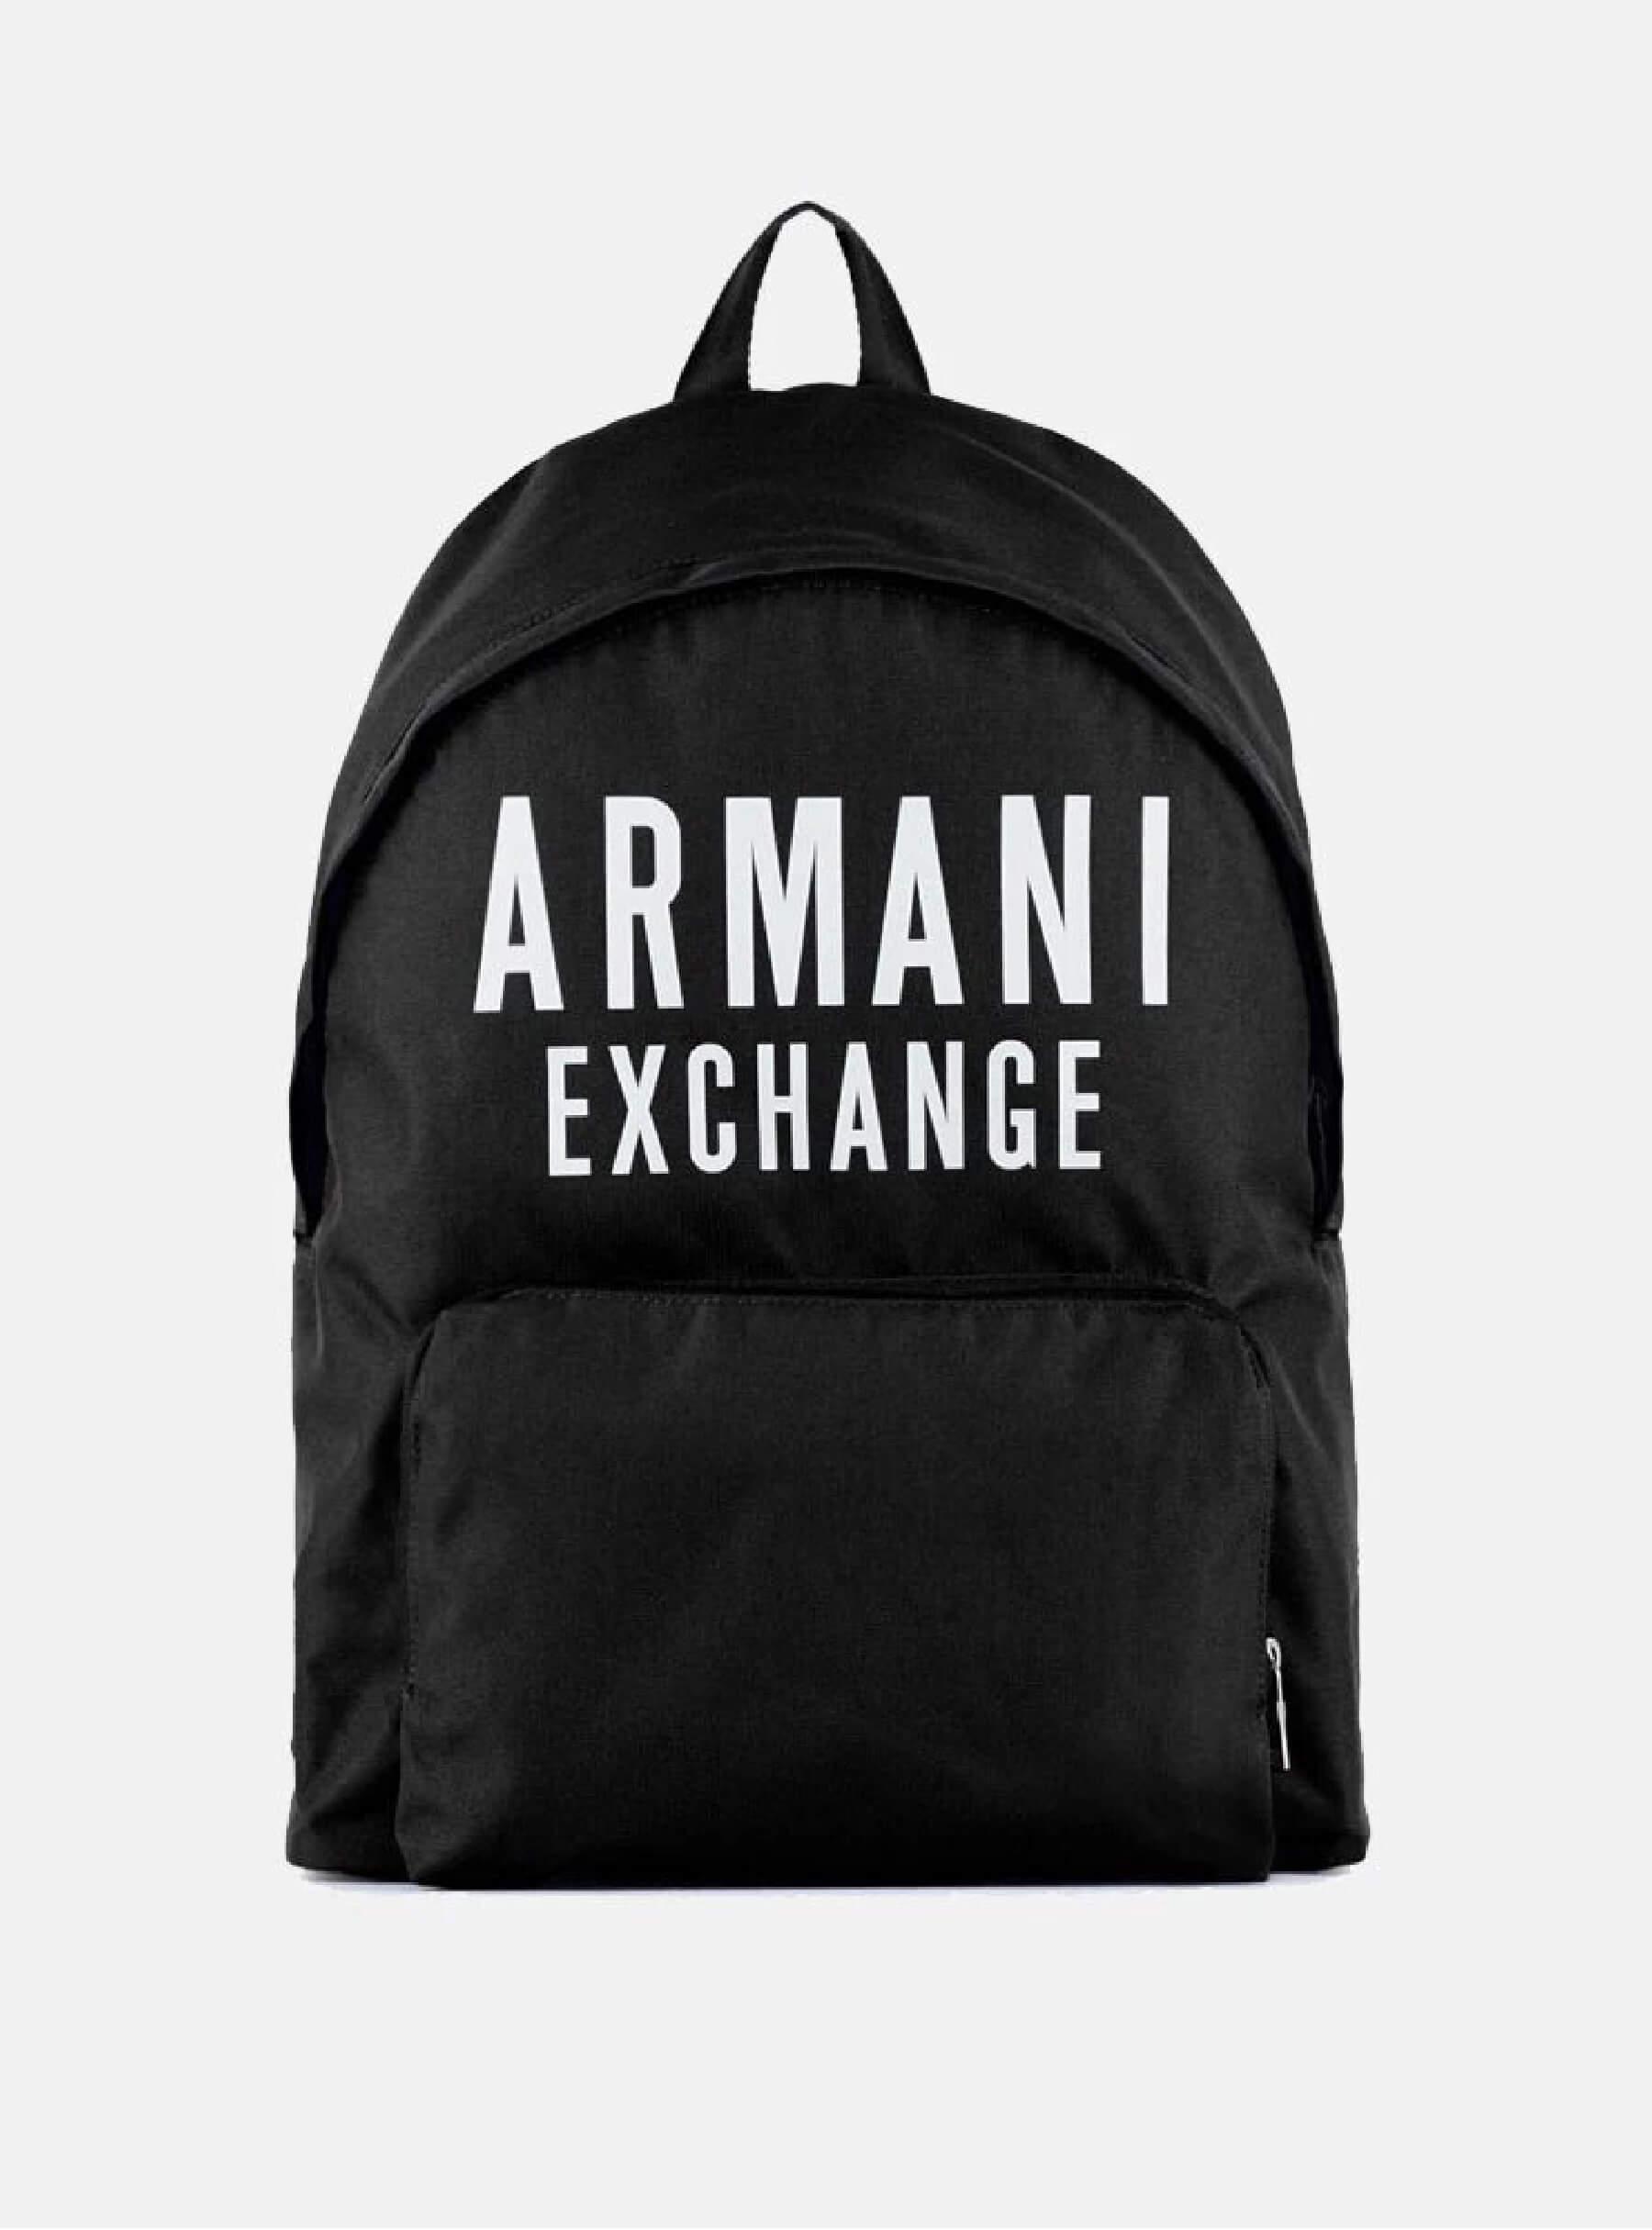 Ranac Armani Exchange 699 kn